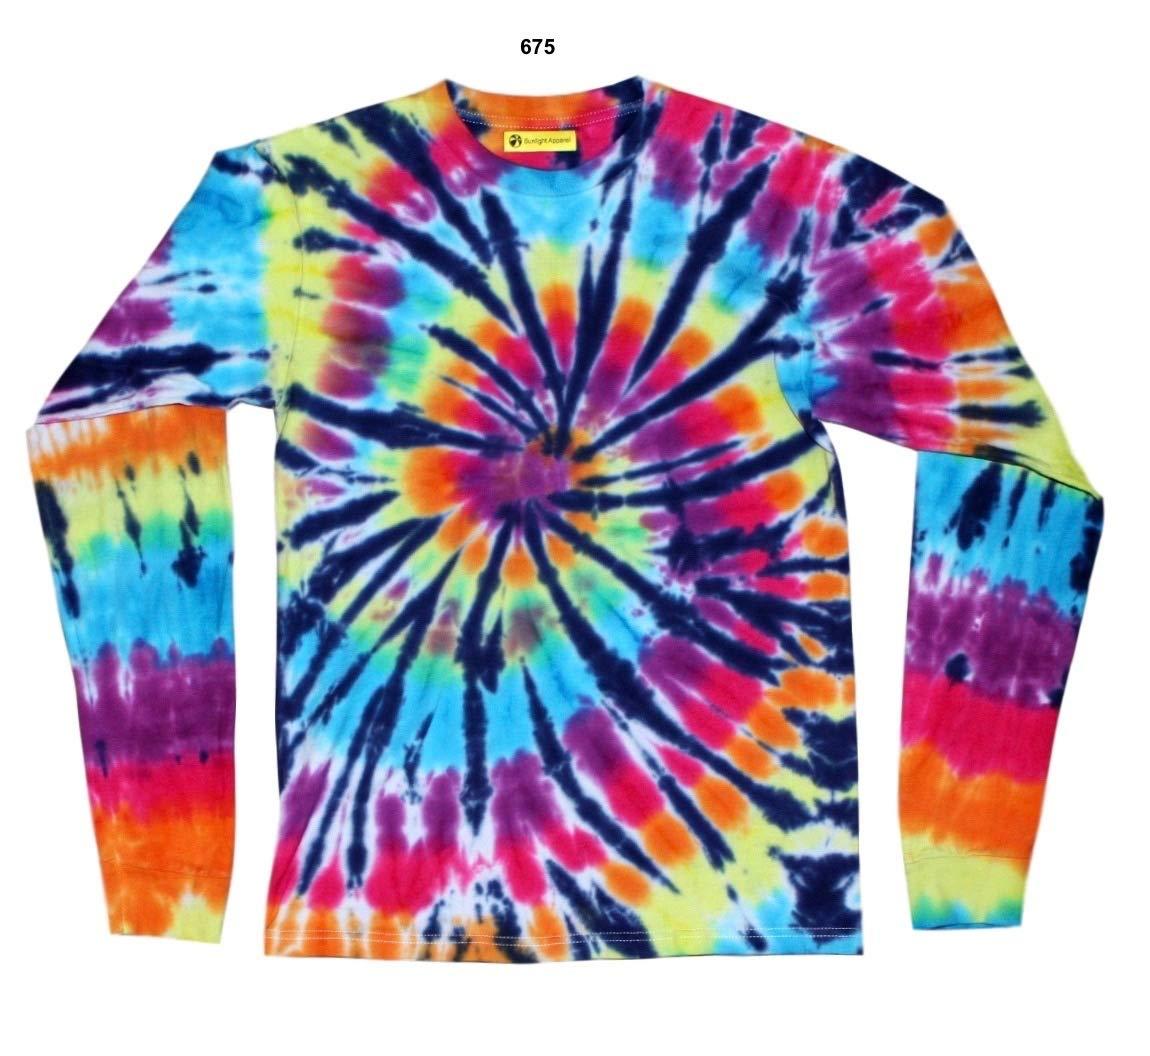 Amazon Com Tie Dye Long Sleeve Shirt Unisex Men S Small Handmade